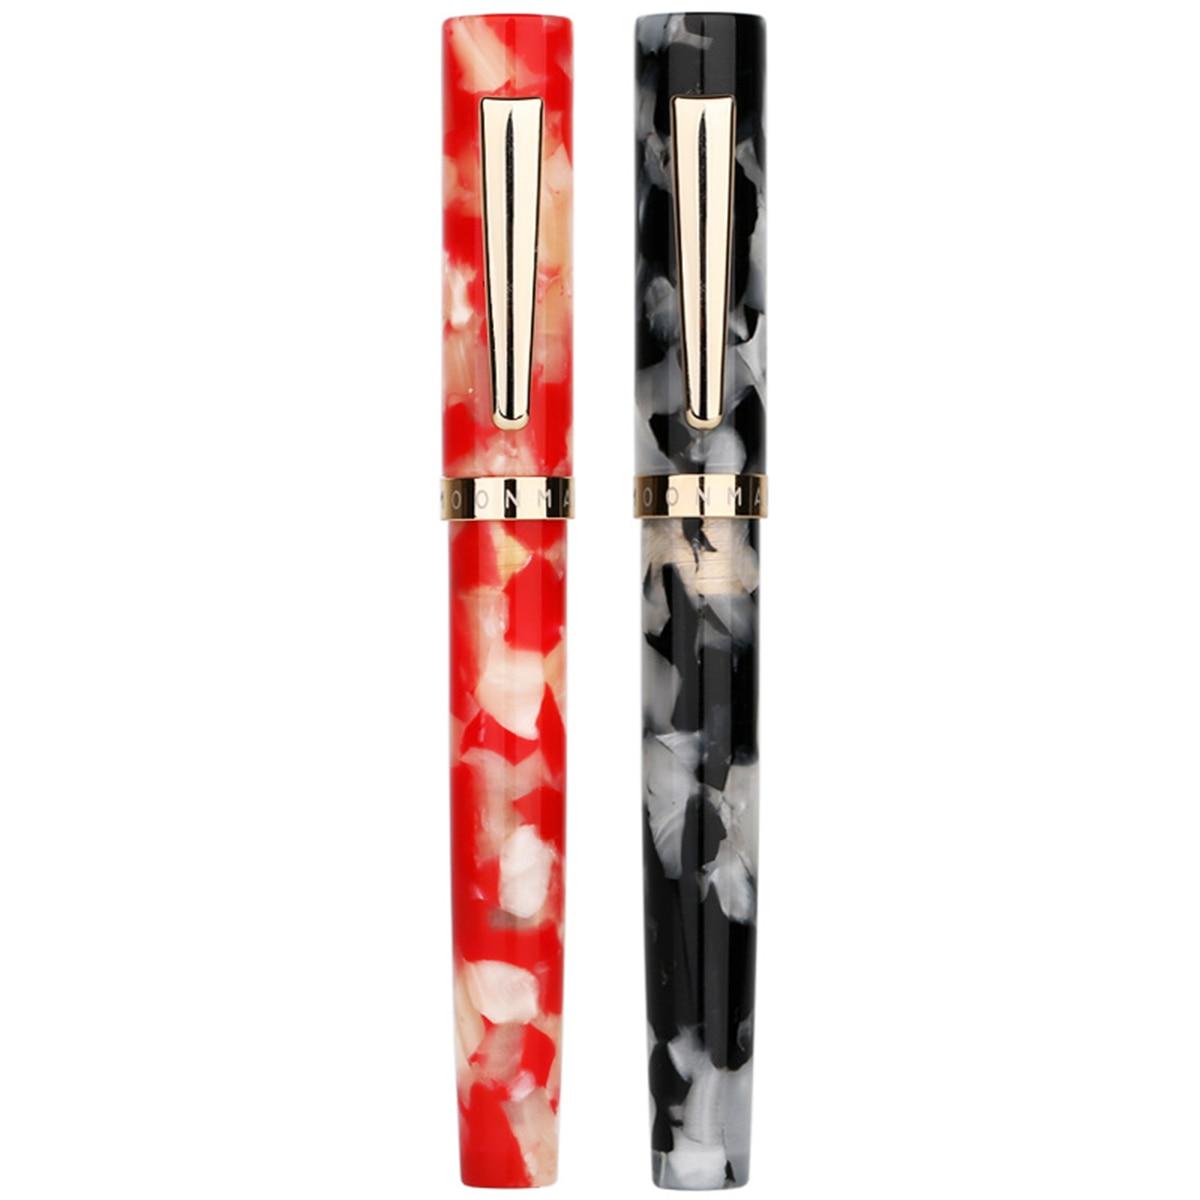 KICUTE Mini Business 0,5 0,38mm pluma estilográfica corta de resina acrílica Caballero pluma para regalo de Navidad con caja de regalo 2 patrones